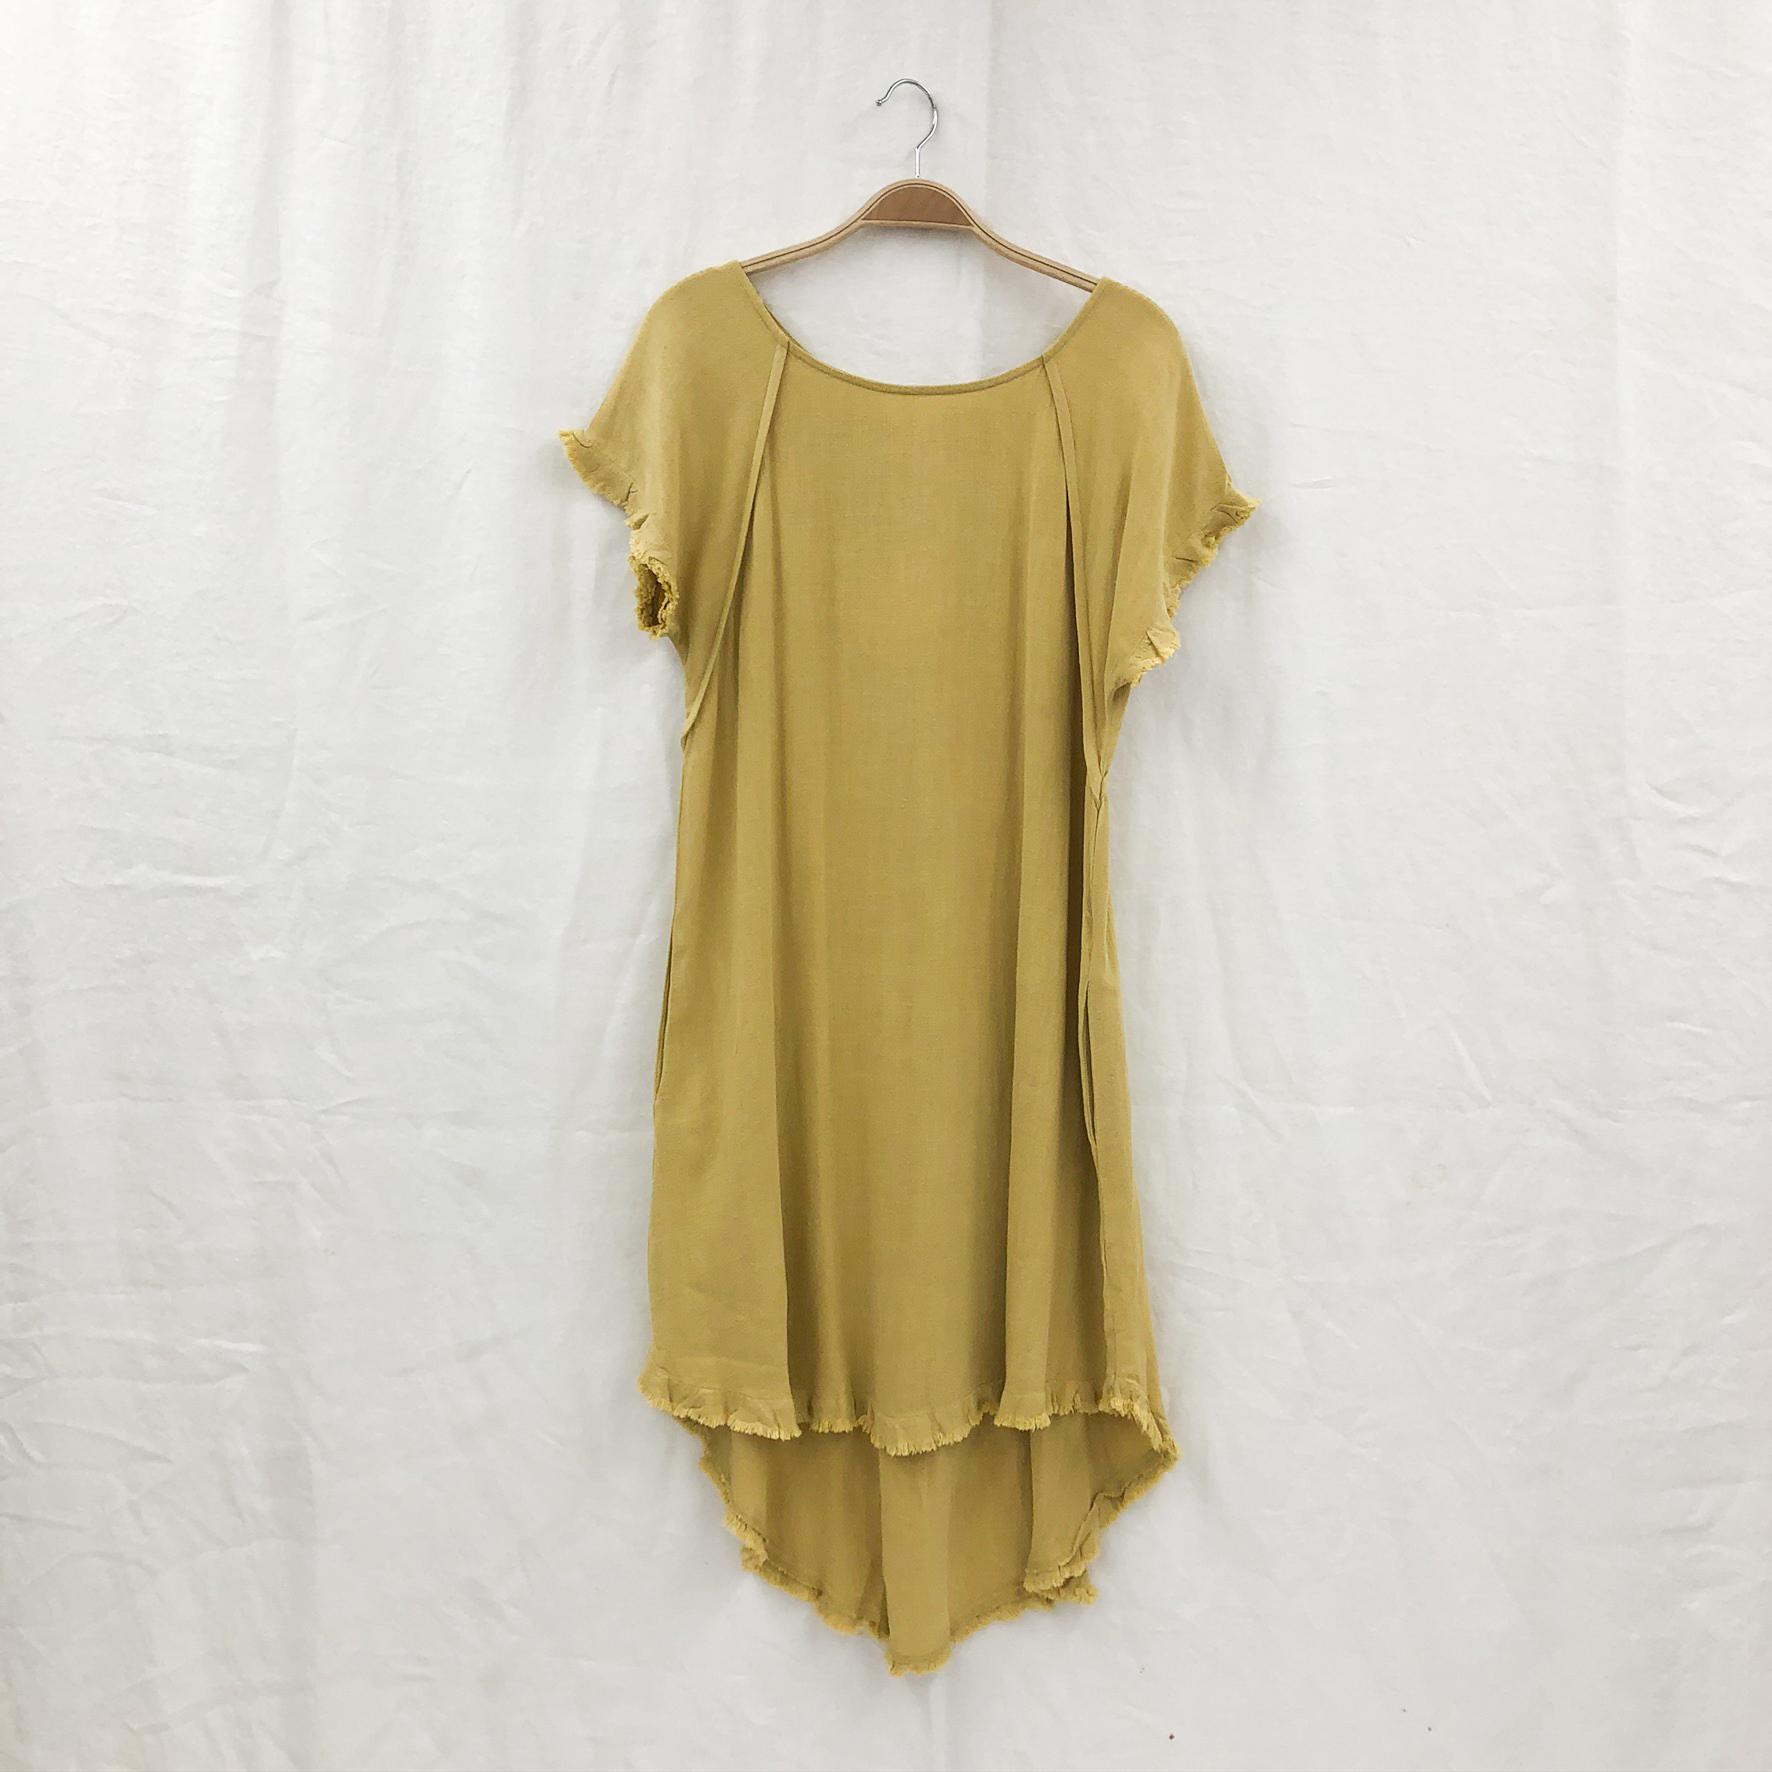 Round Neck Pocket Dress on a Hanger - Golden Yellow